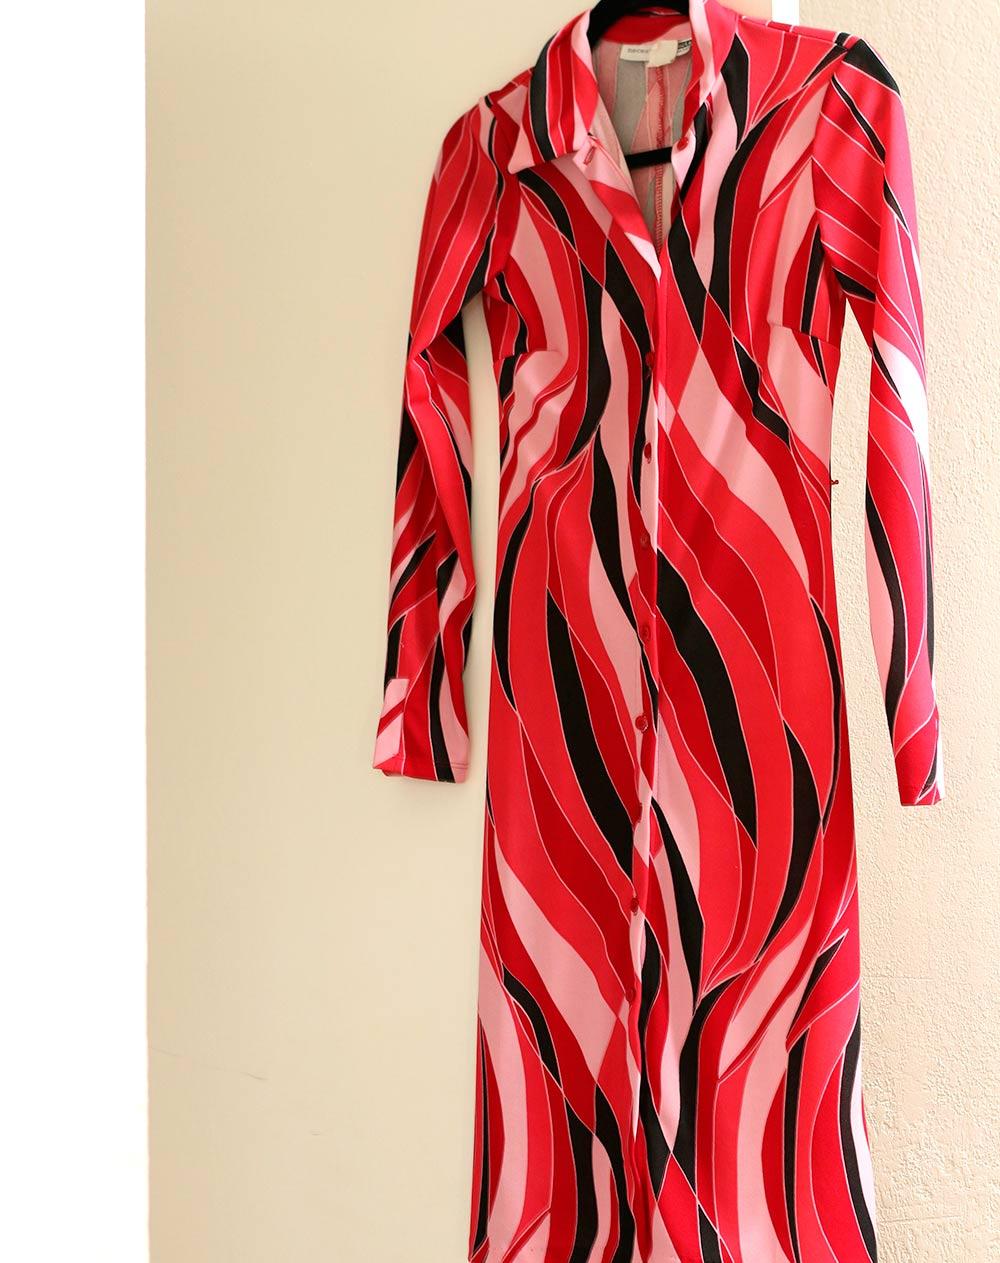 90s dress